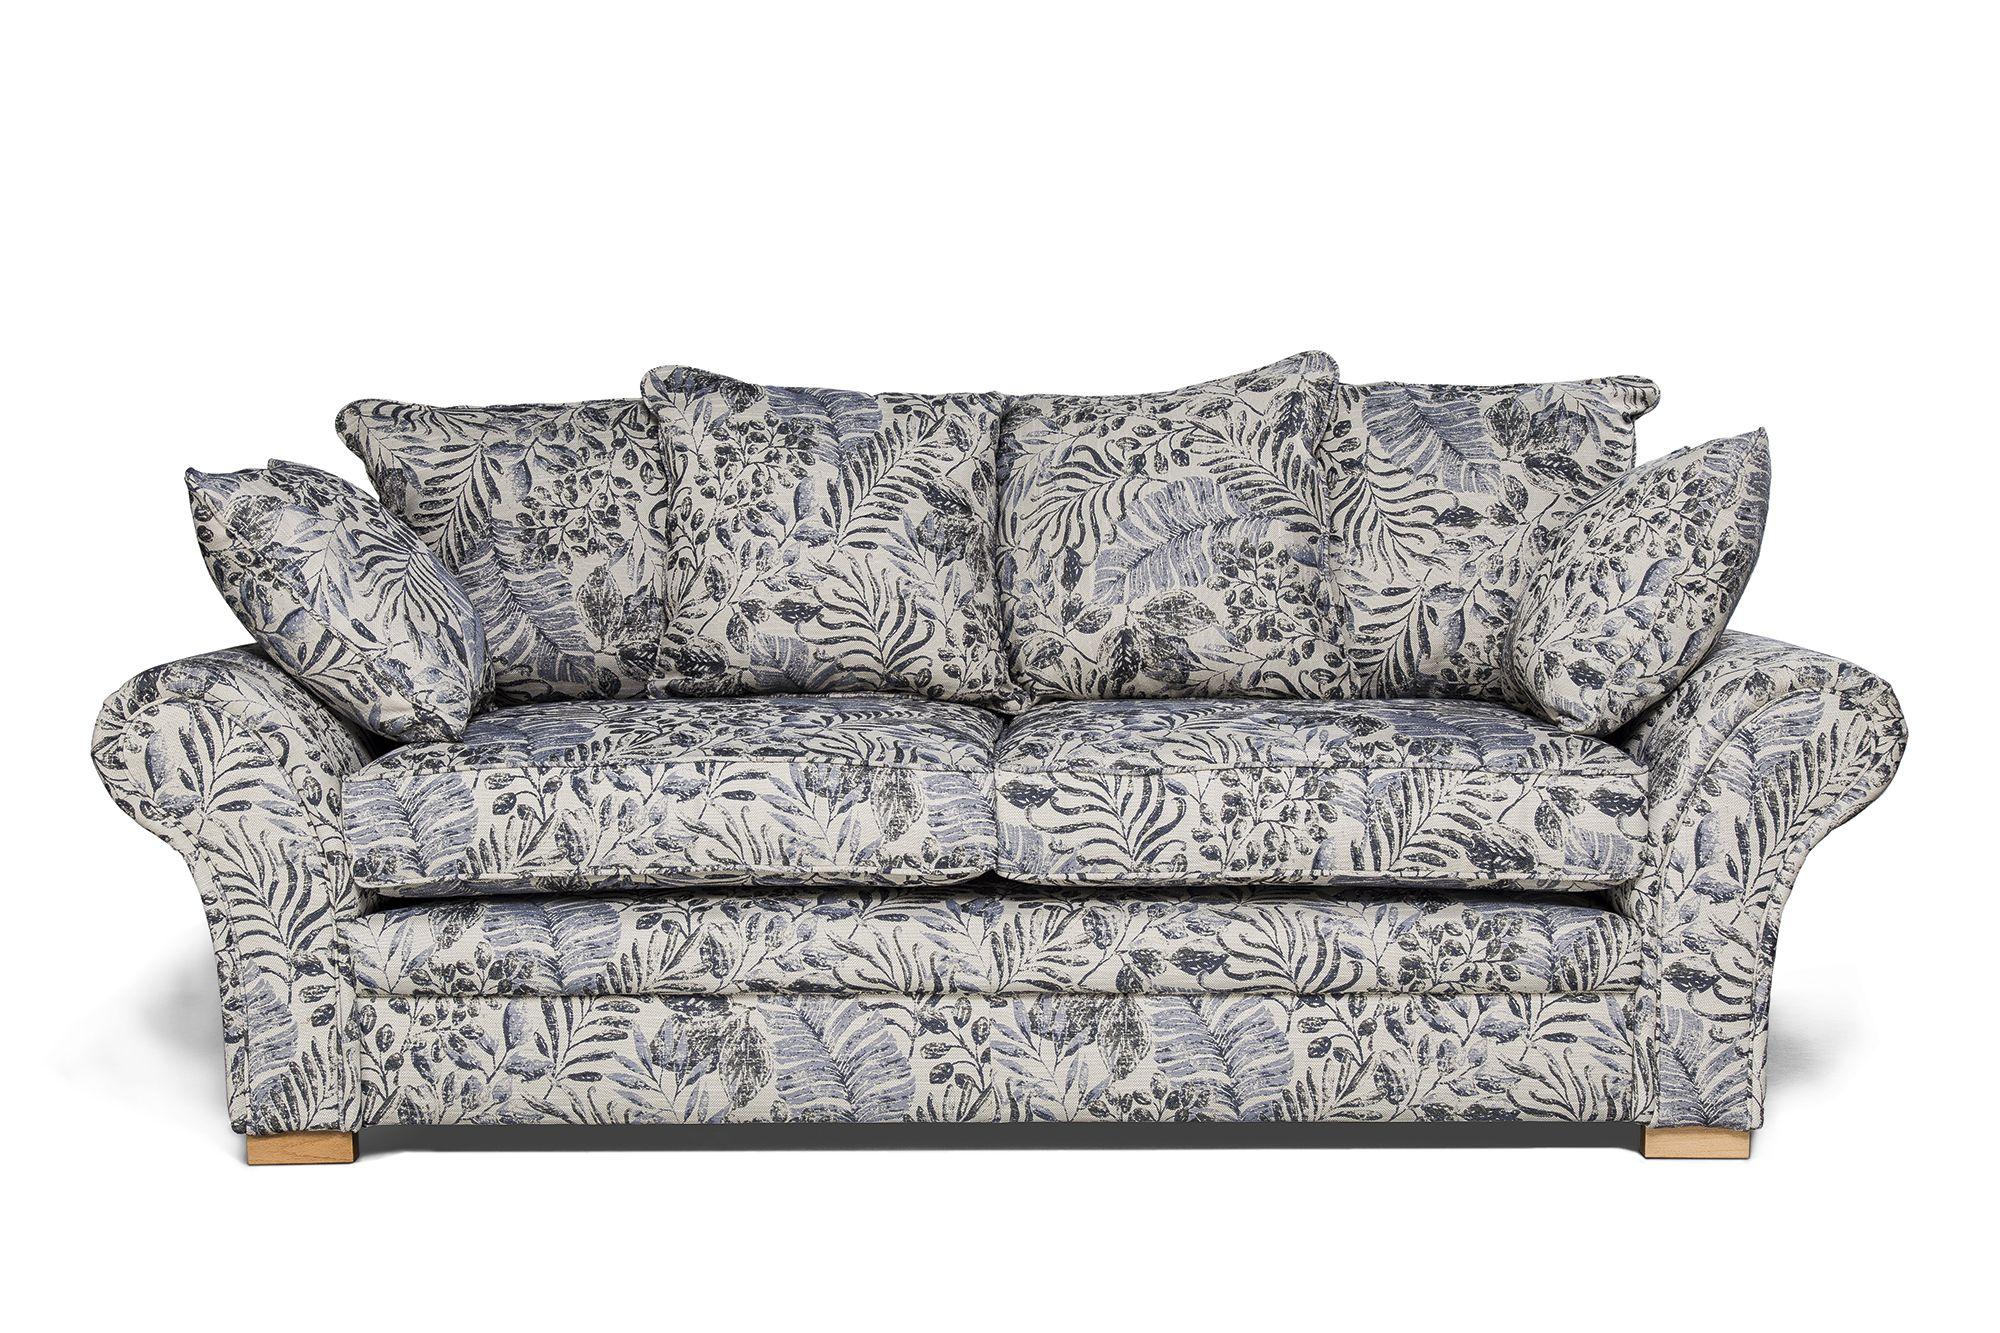 Angielska Sofa 3 Osobowa Mht 335 Home Decor Furniture Love Seat